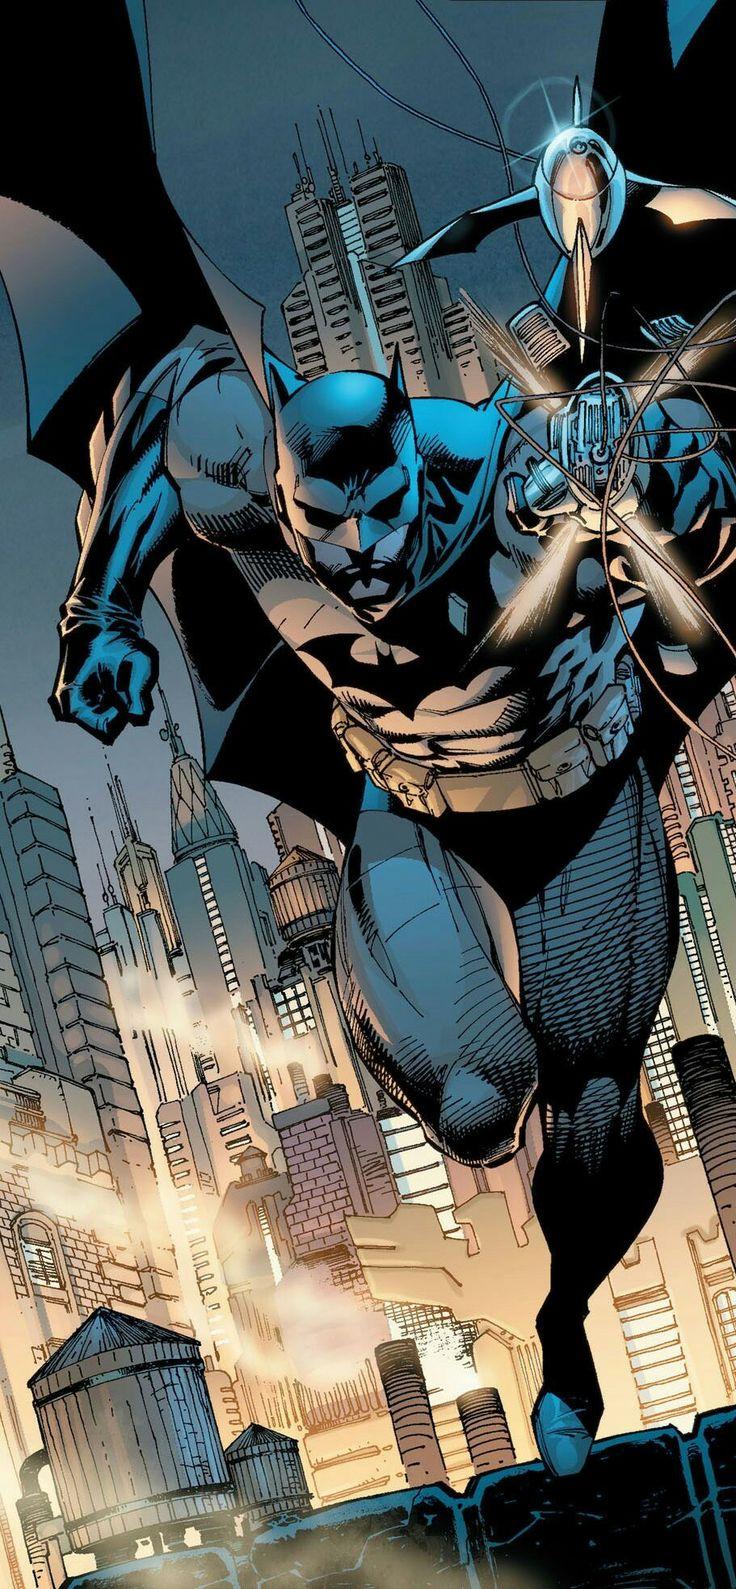 Batman: Hush by Jim Lee